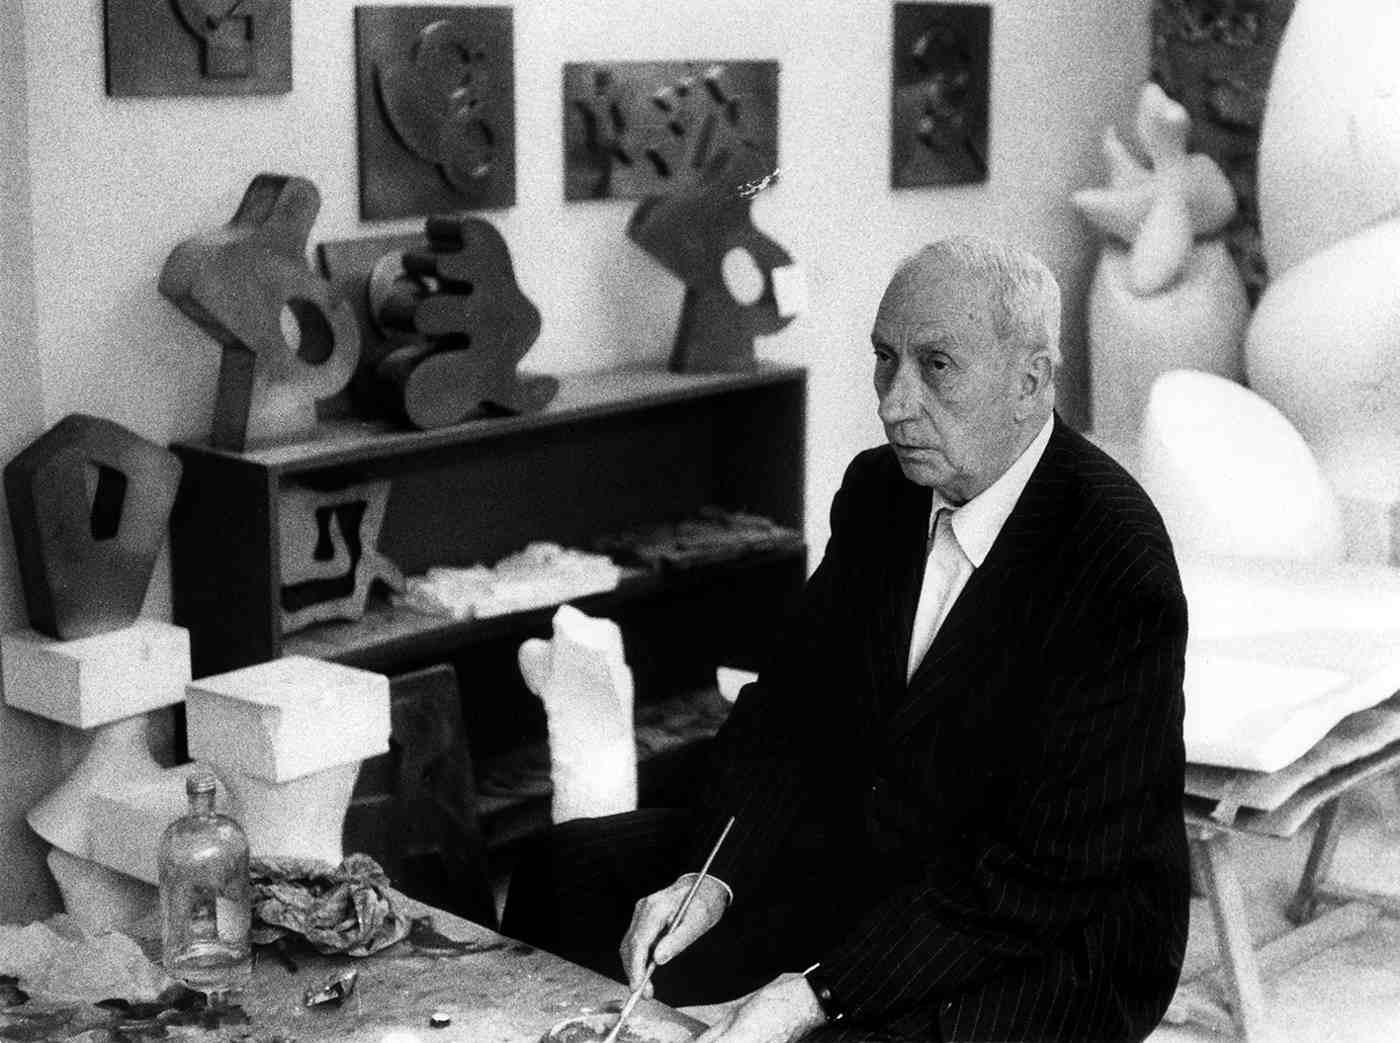 Hans Arp in his studio in Clamart, c. 1960 (Photograph: Etienne B. Weil)